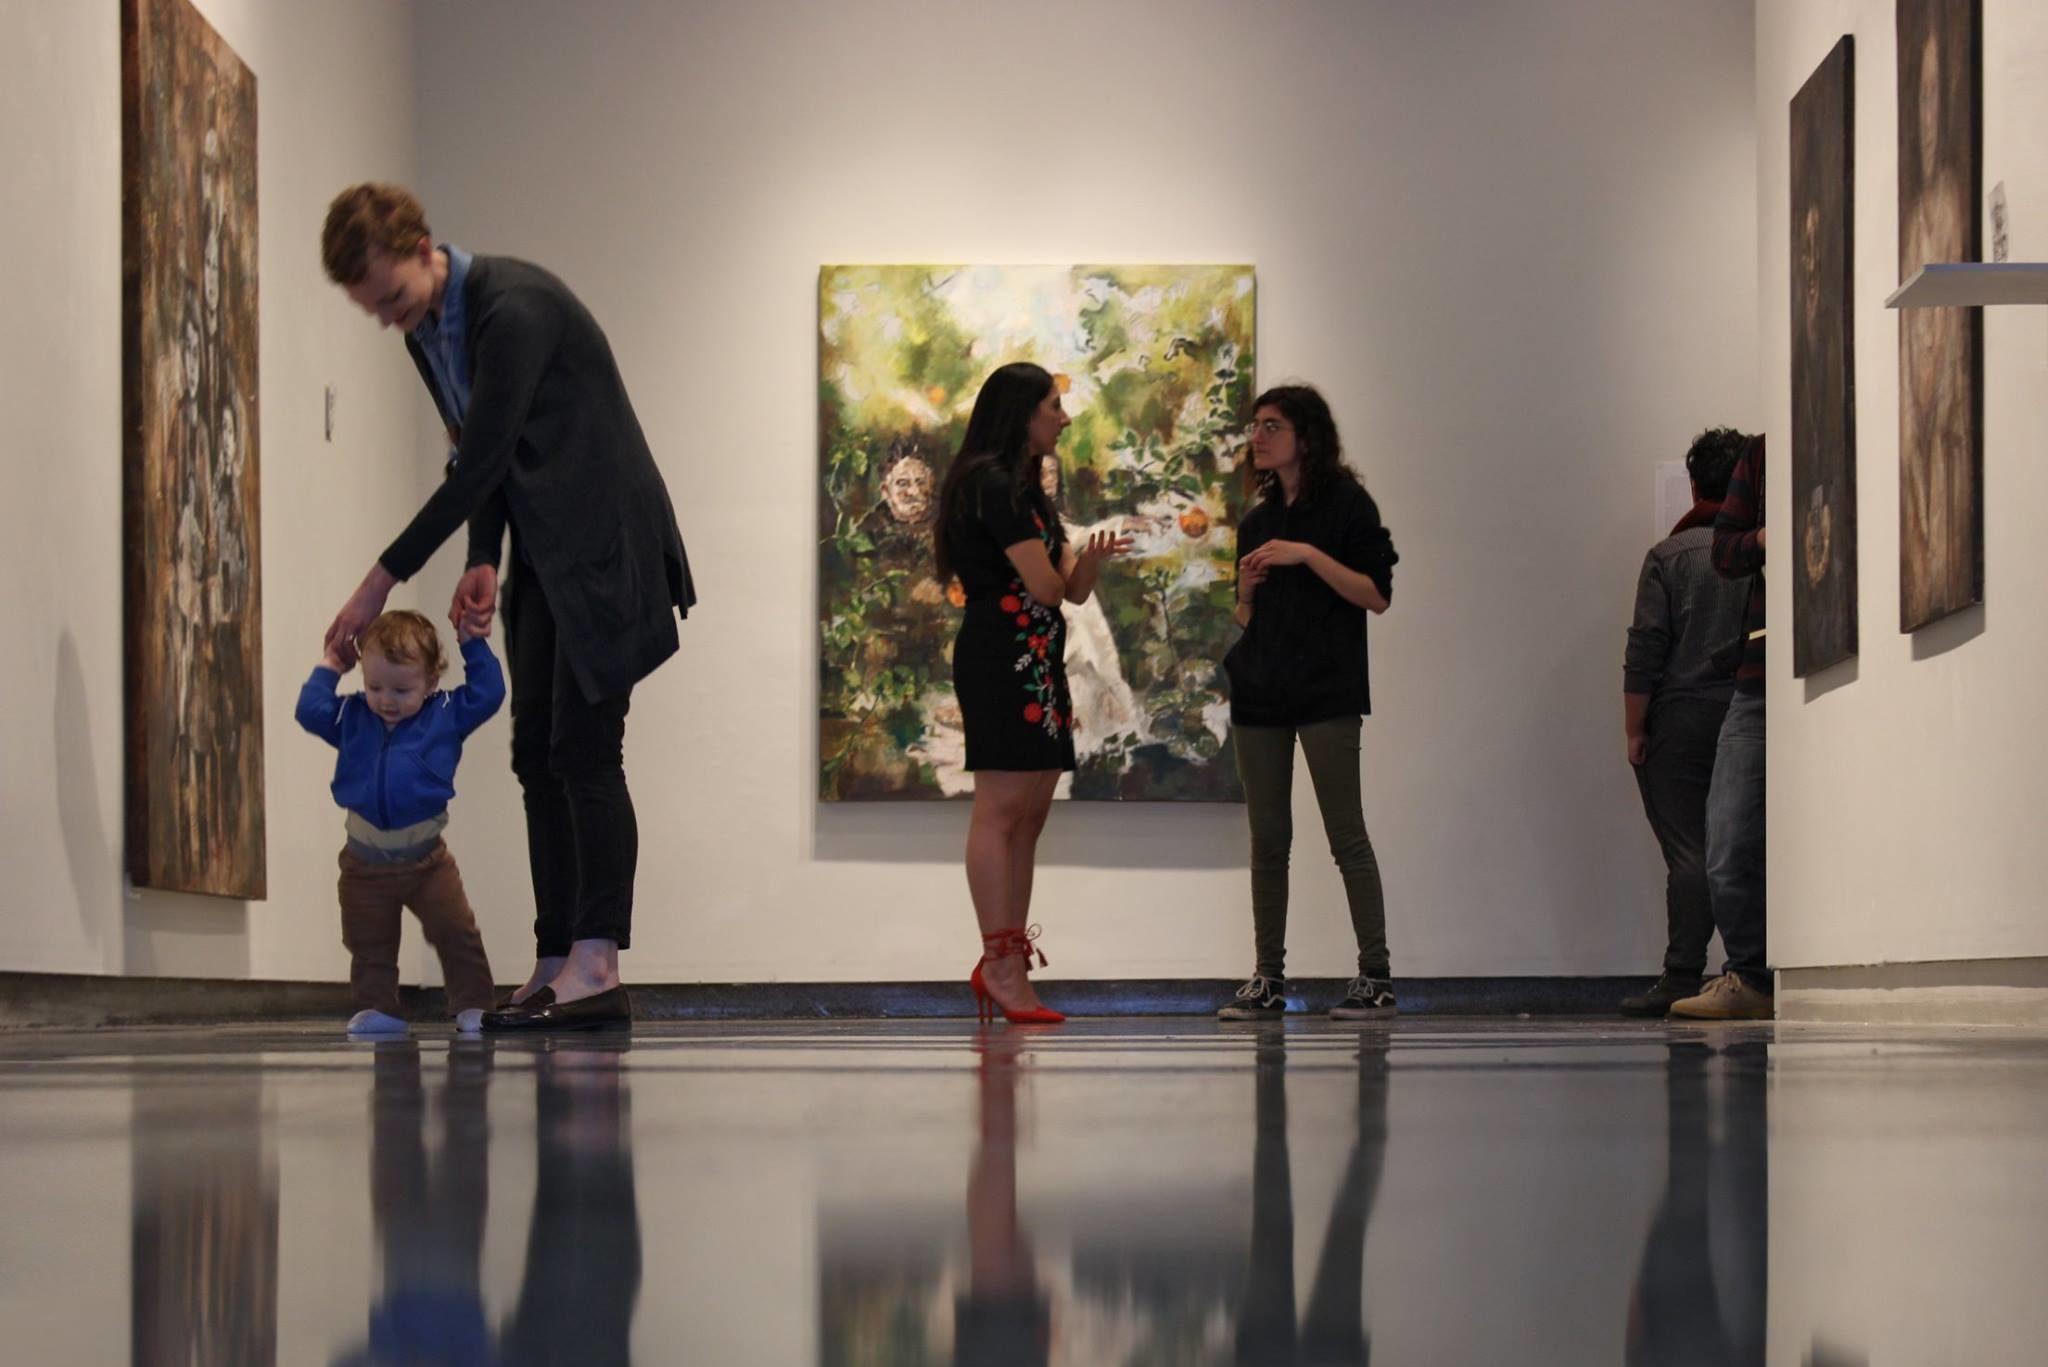 Jeanette Habash - Senior Exhibition